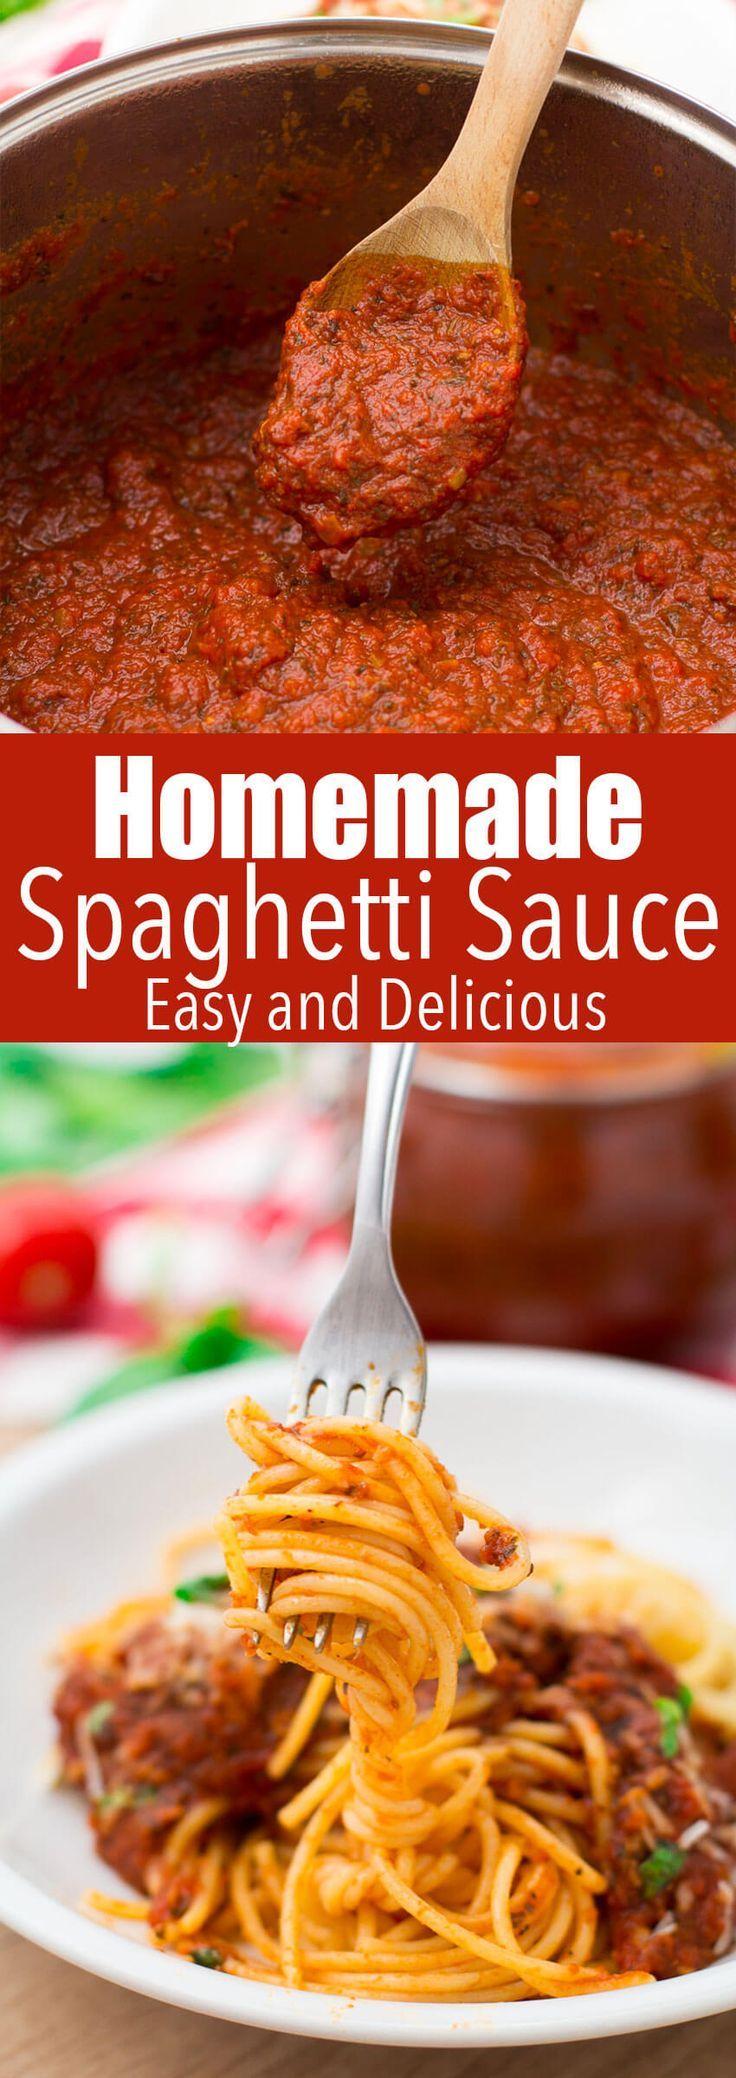 Homemade Spaghetti Sauce – Easy Peasy Meals